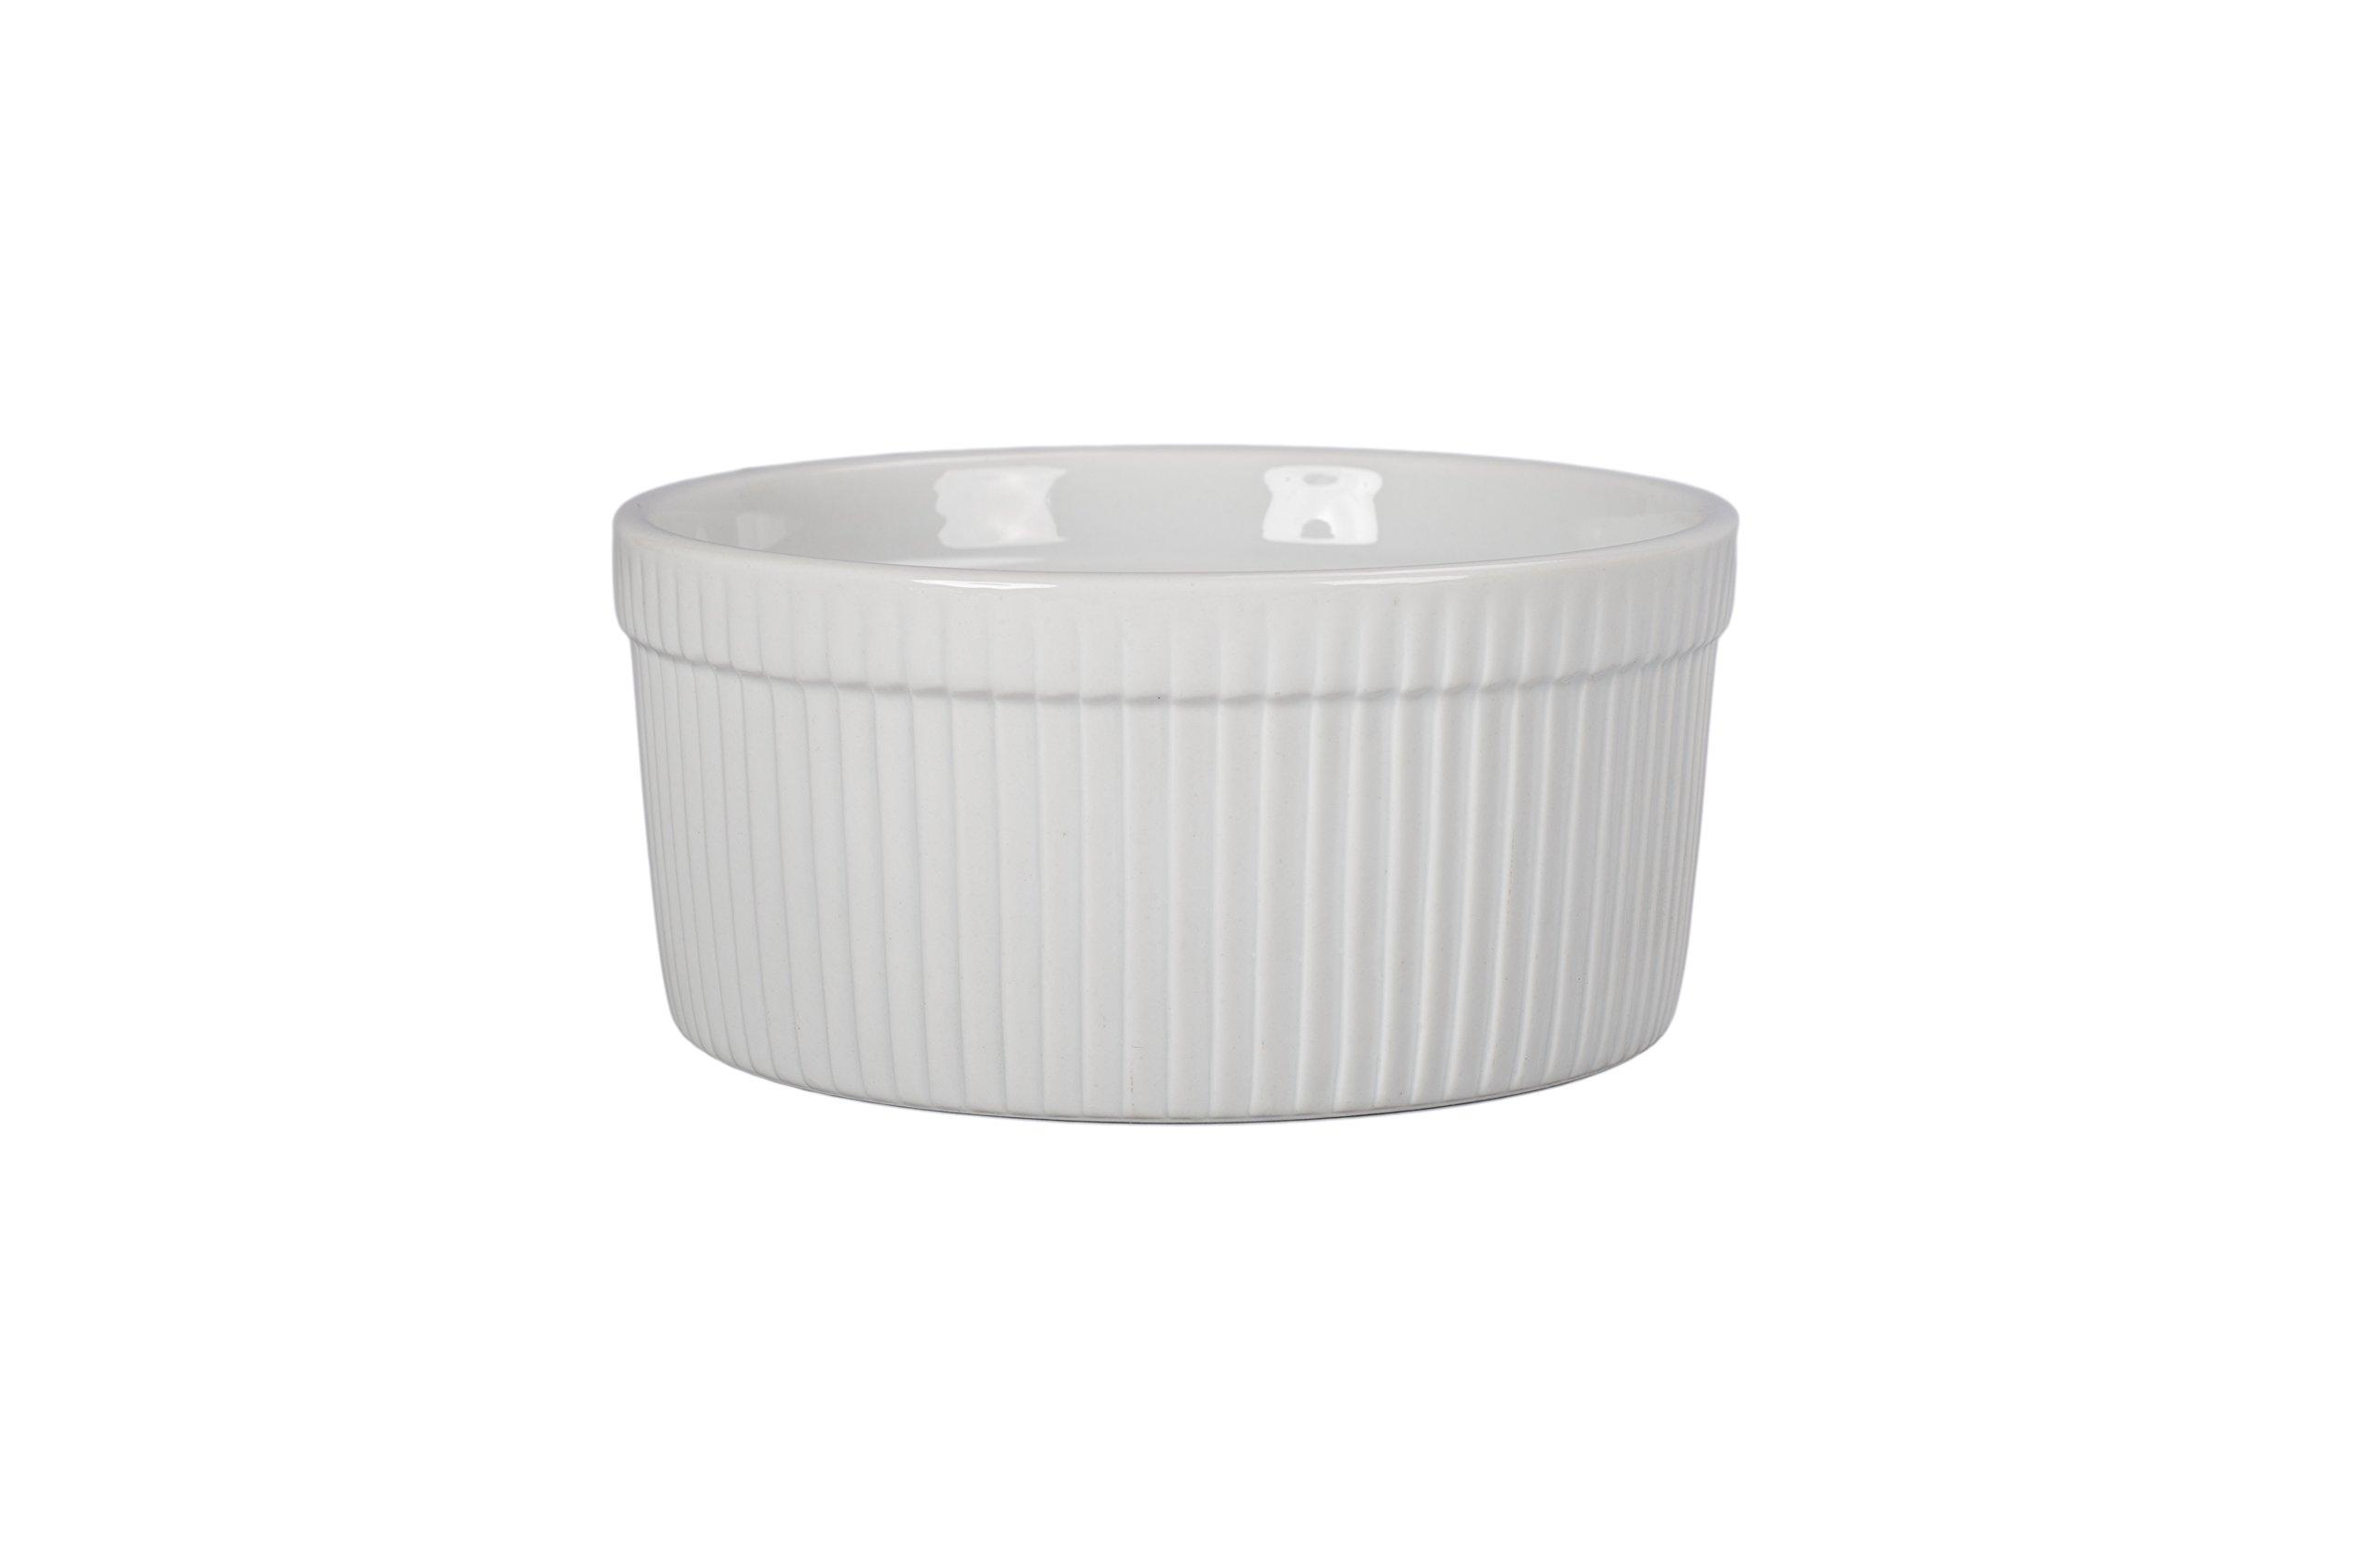 BIA Cordon Bleu 900017S1SIOC Classic Bakeware Souffle Dish, White